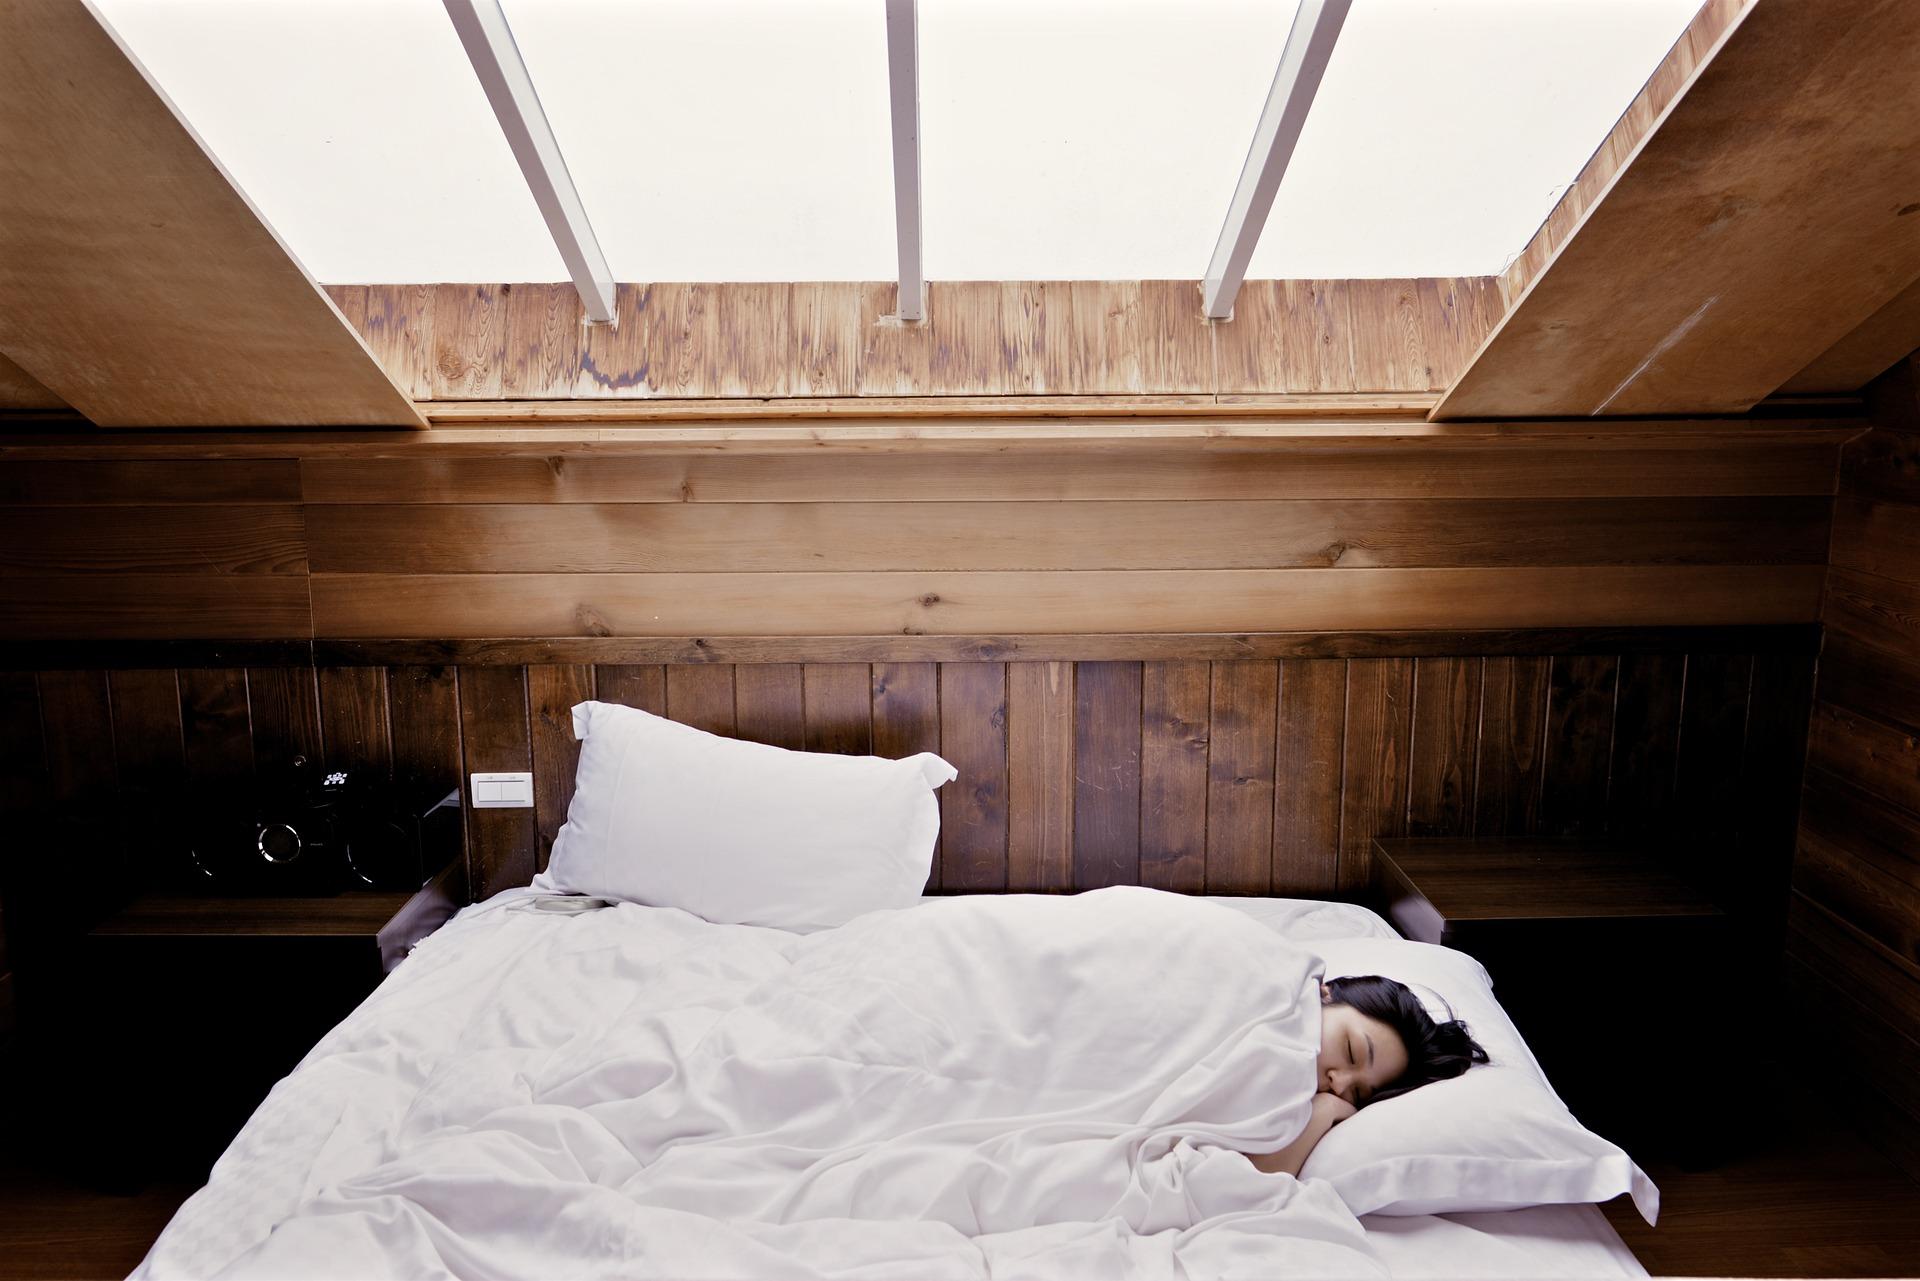 Sleeping Better – How to Achieve a Healthy Sleep